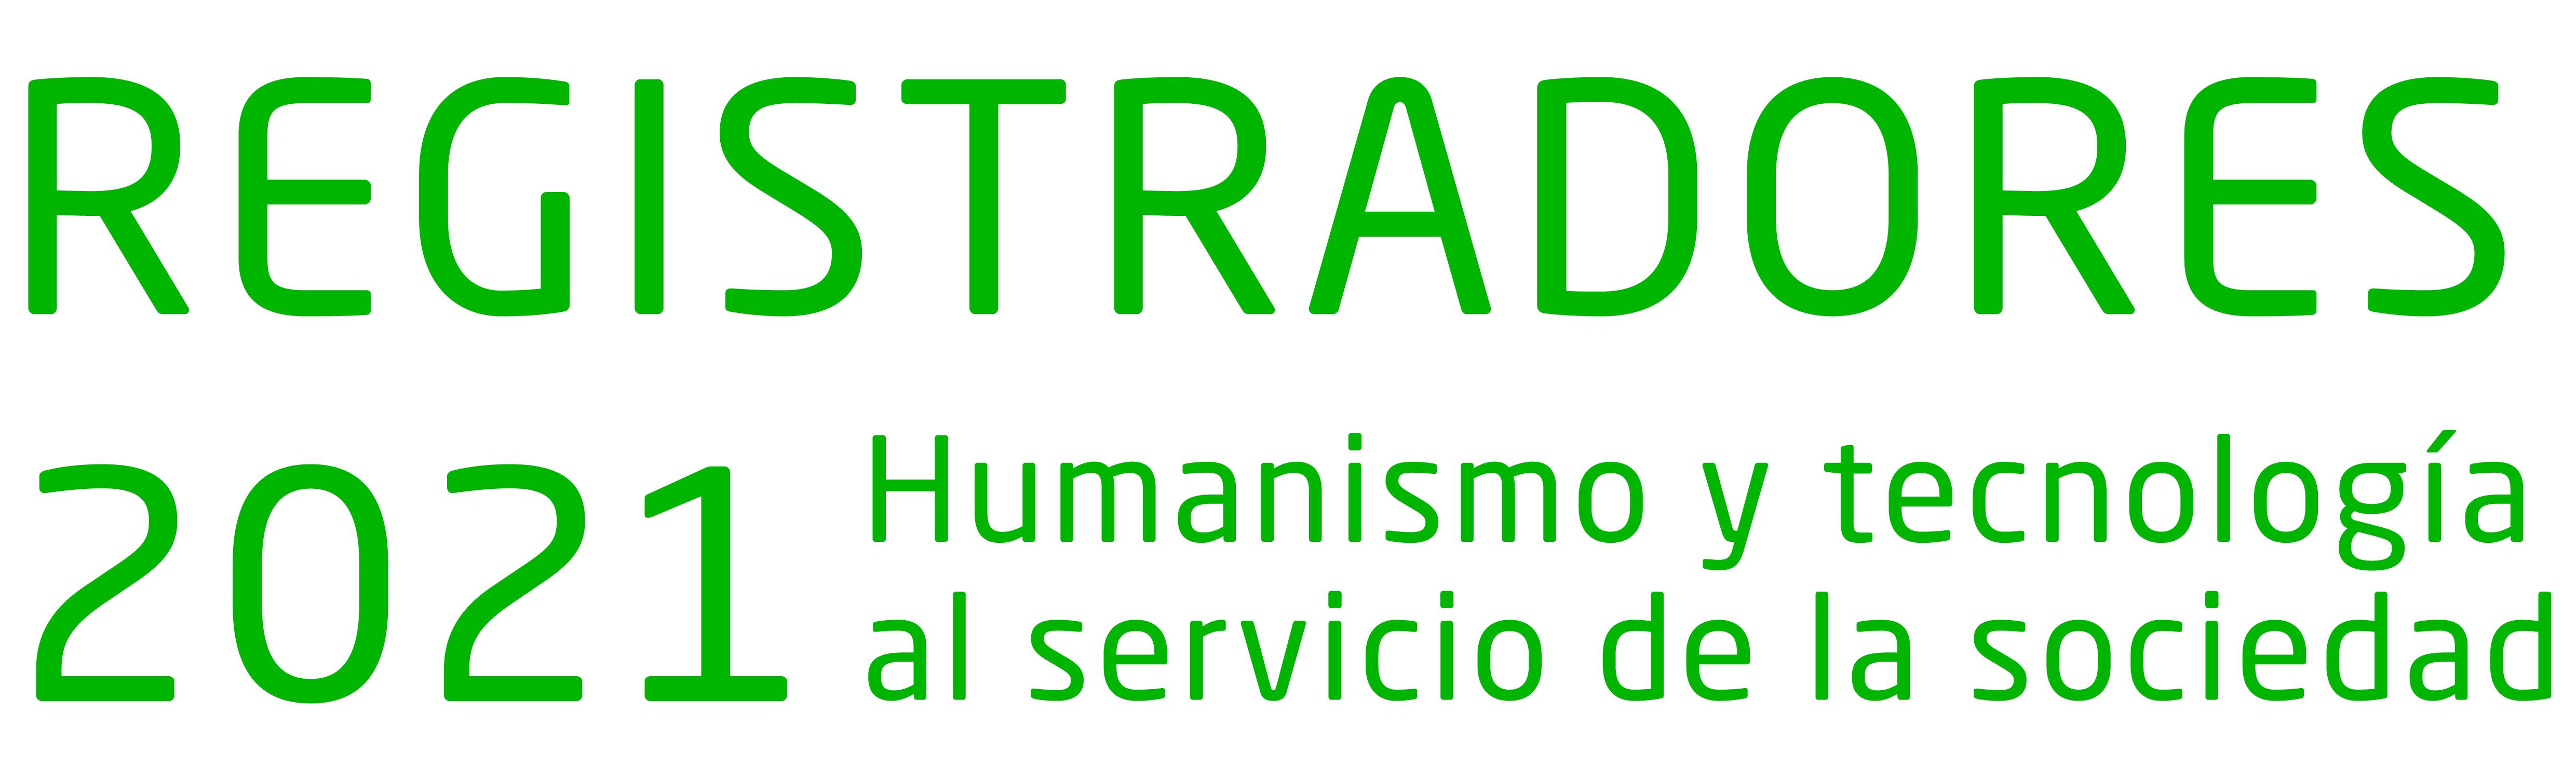 VI Congreso Nacional de Registradores de España